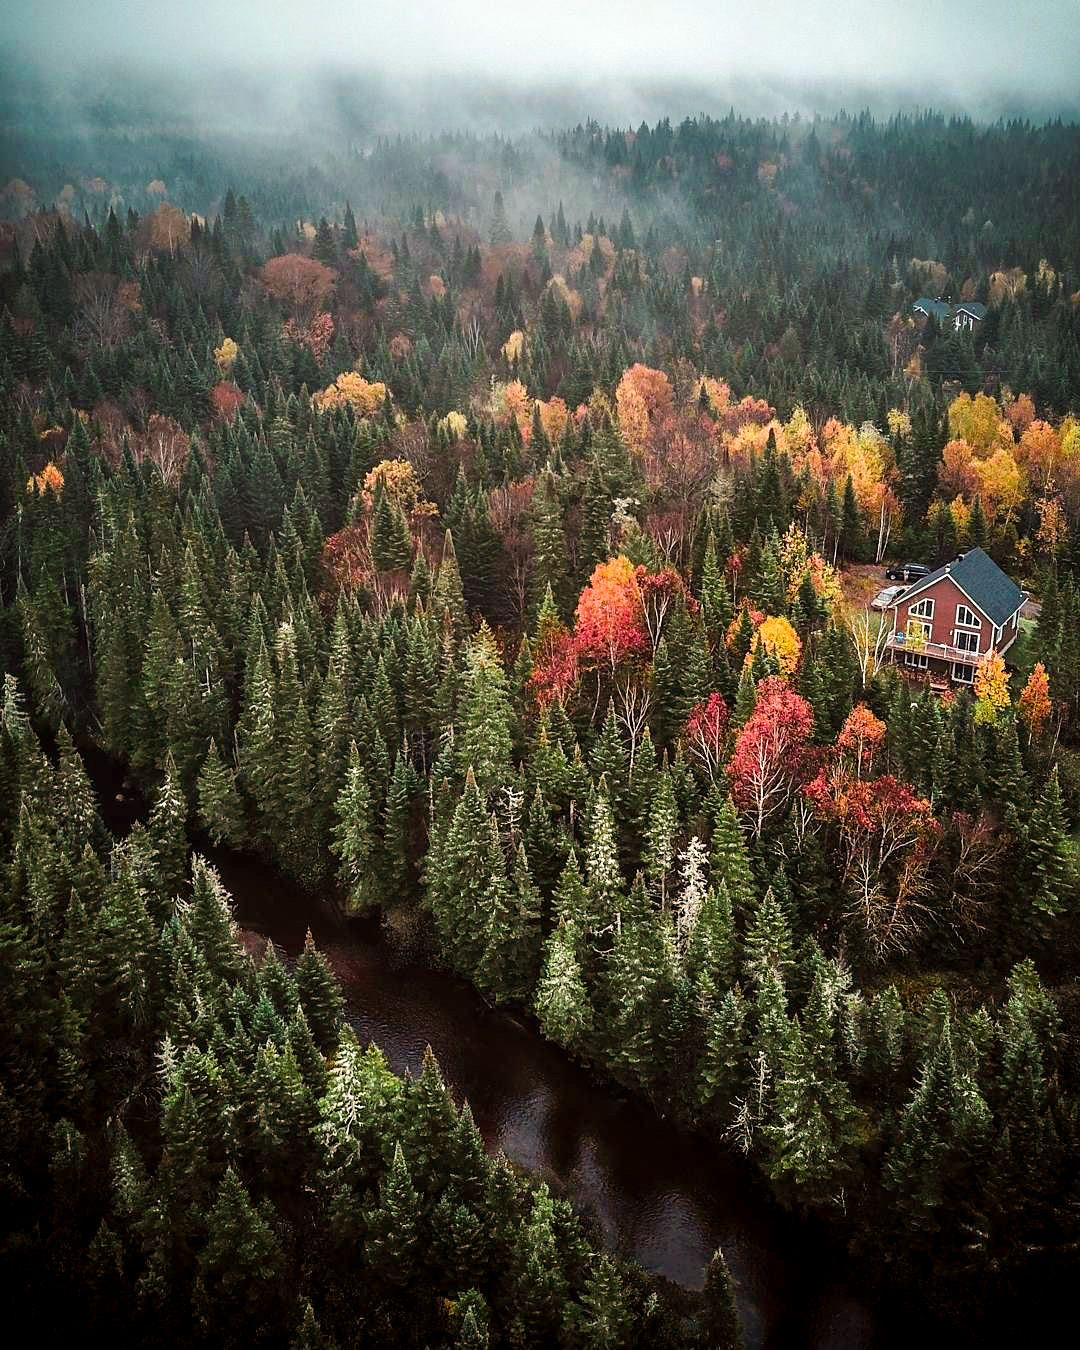 Cabin in the woods (Mont-Tremblant, Québec) by Zimy Da Kid (@zimydakid) on Instagram